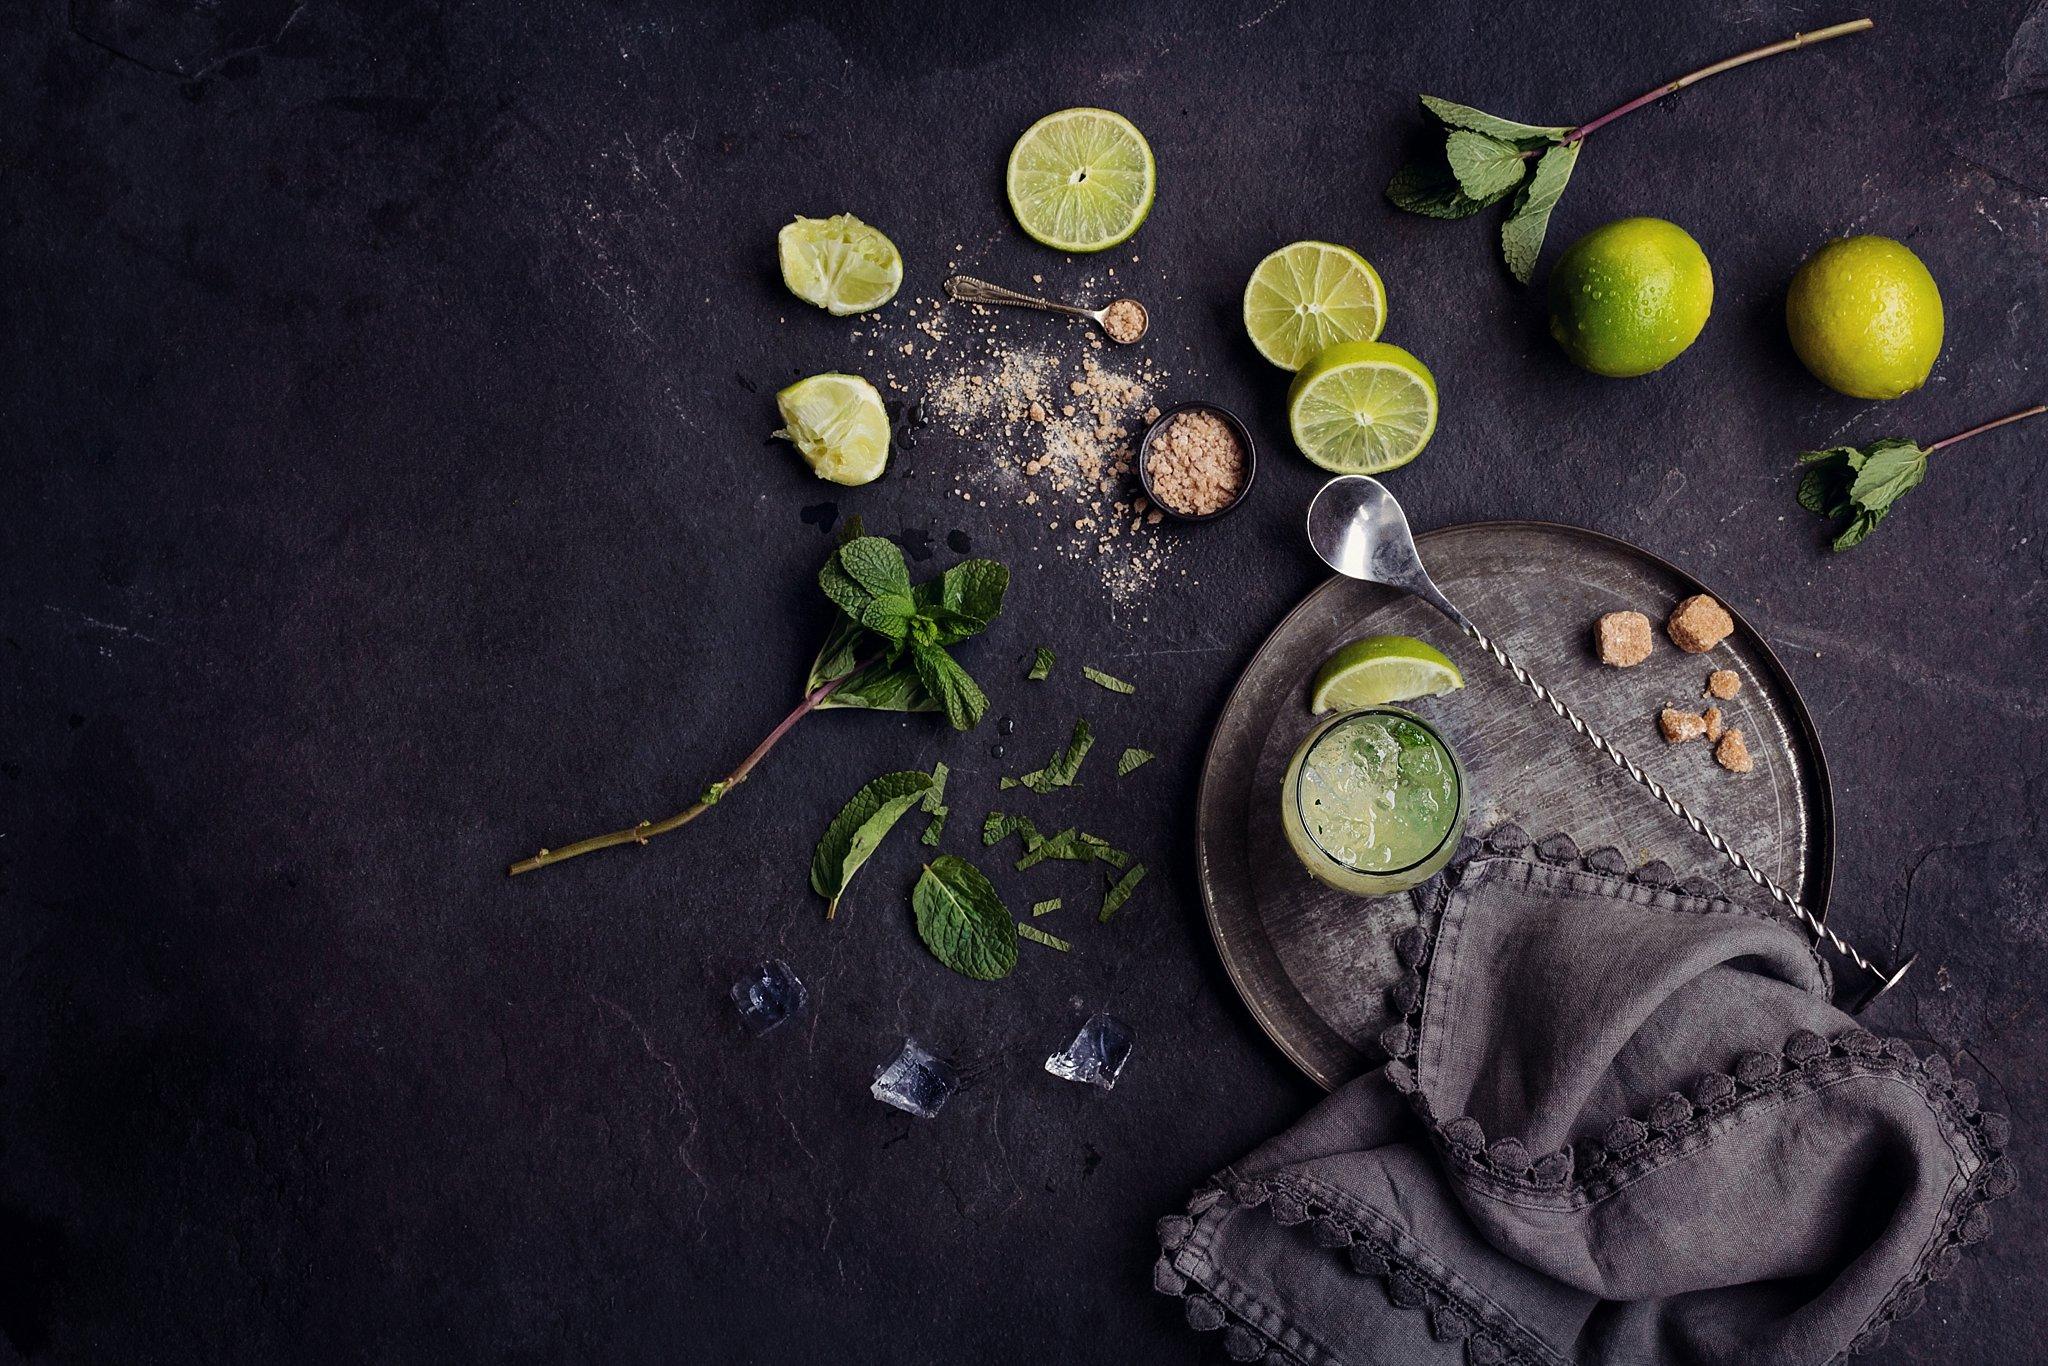 Cocktail Mixology - Lemons mint sugar and mixer